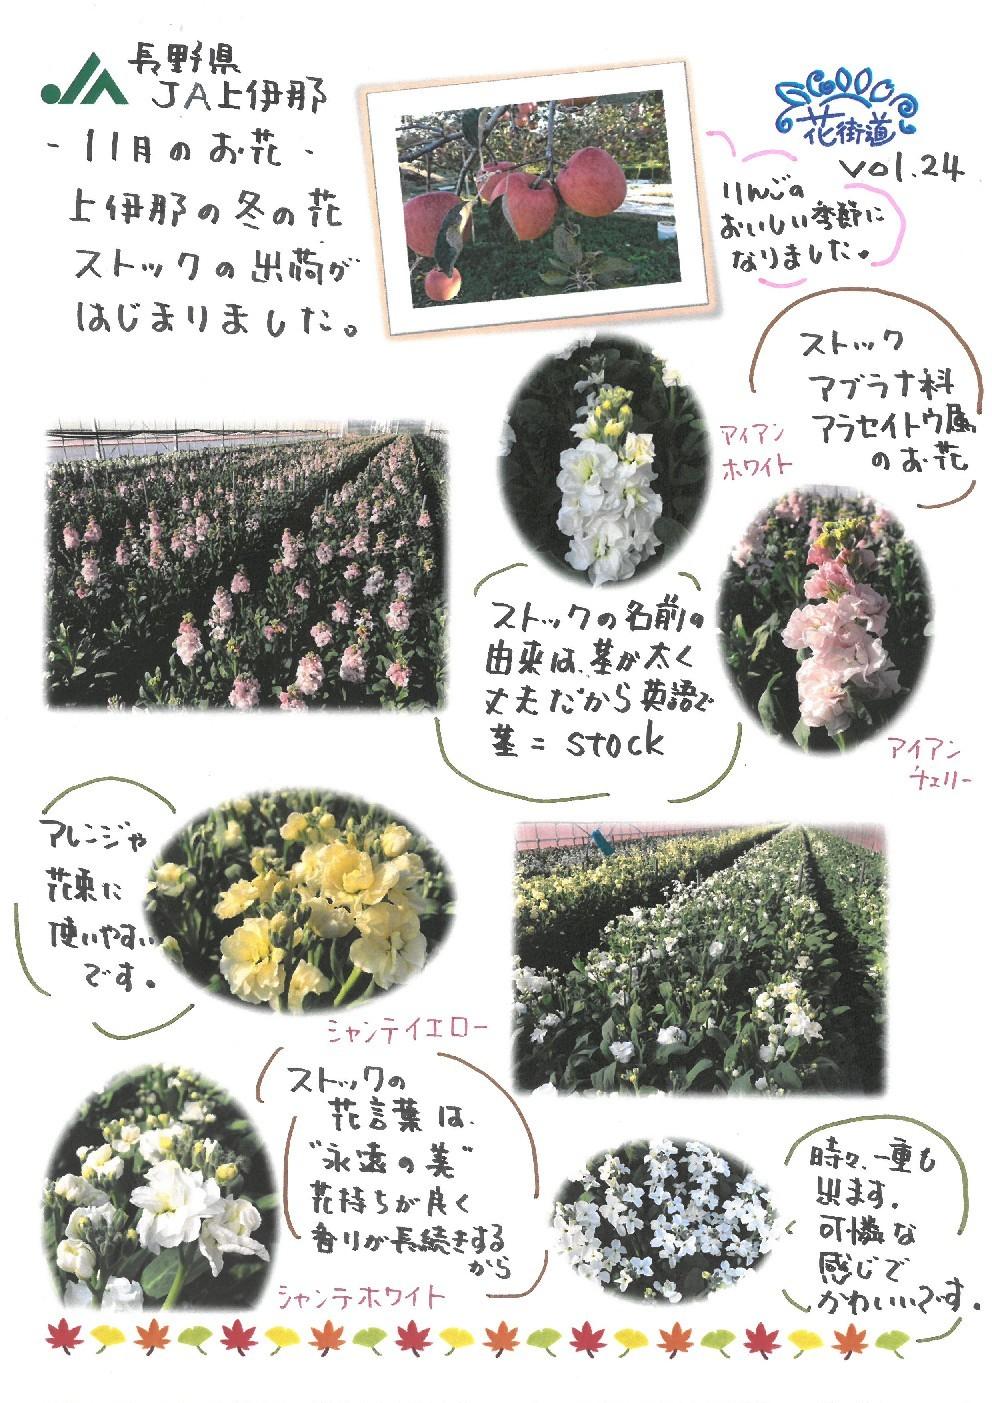 草花紹介ポップ!vol.24_d0062298_20364682.jpg